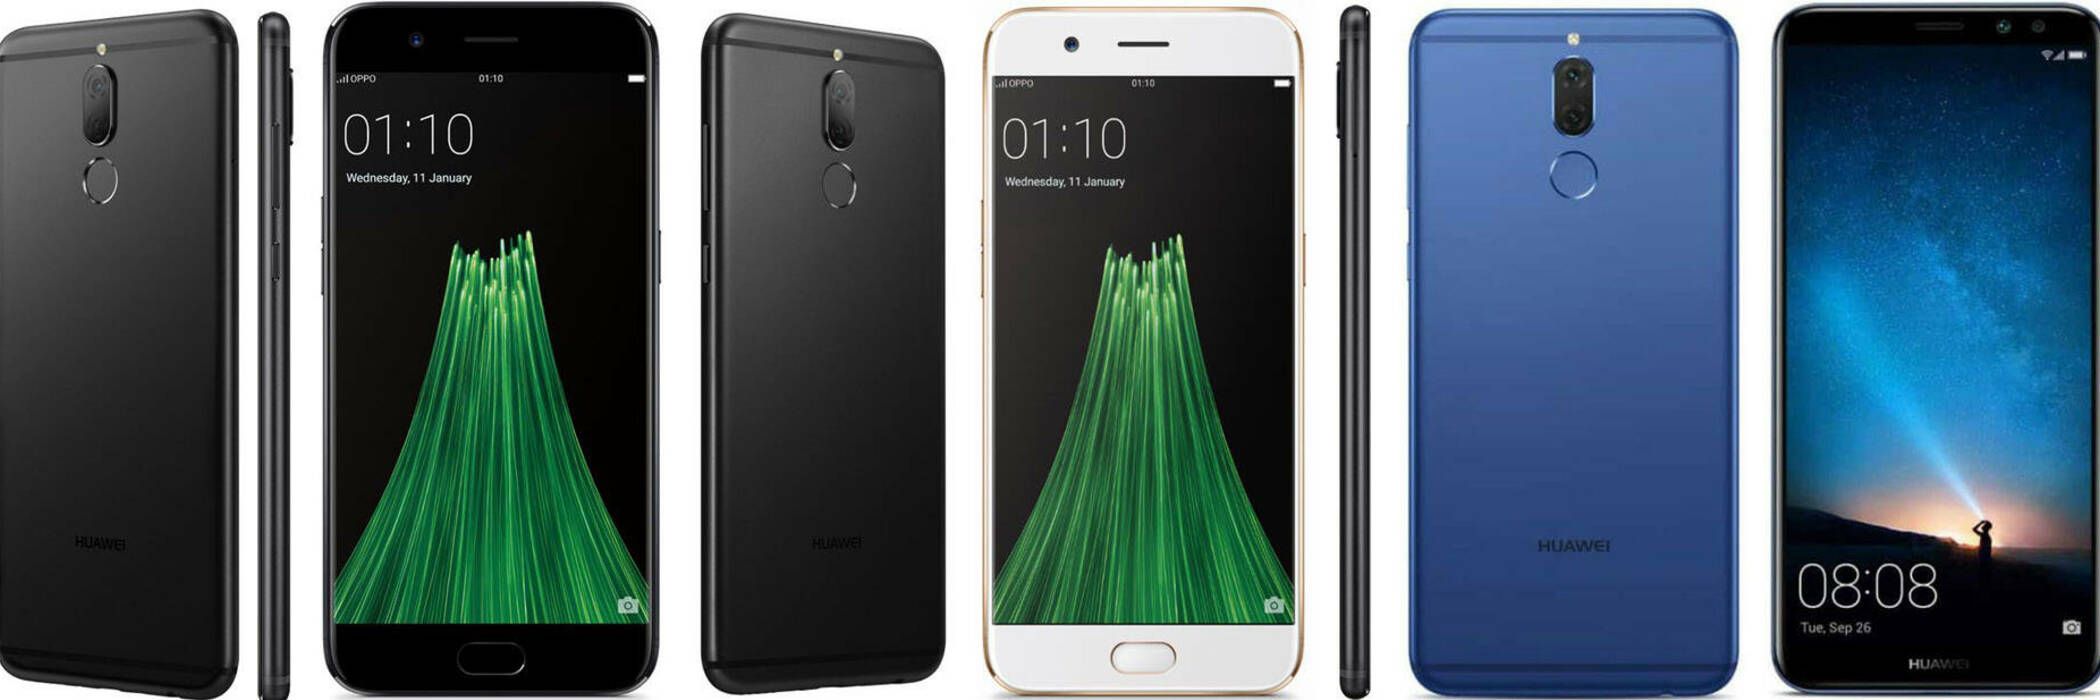 Huawei Nova 2i and Oppo R11